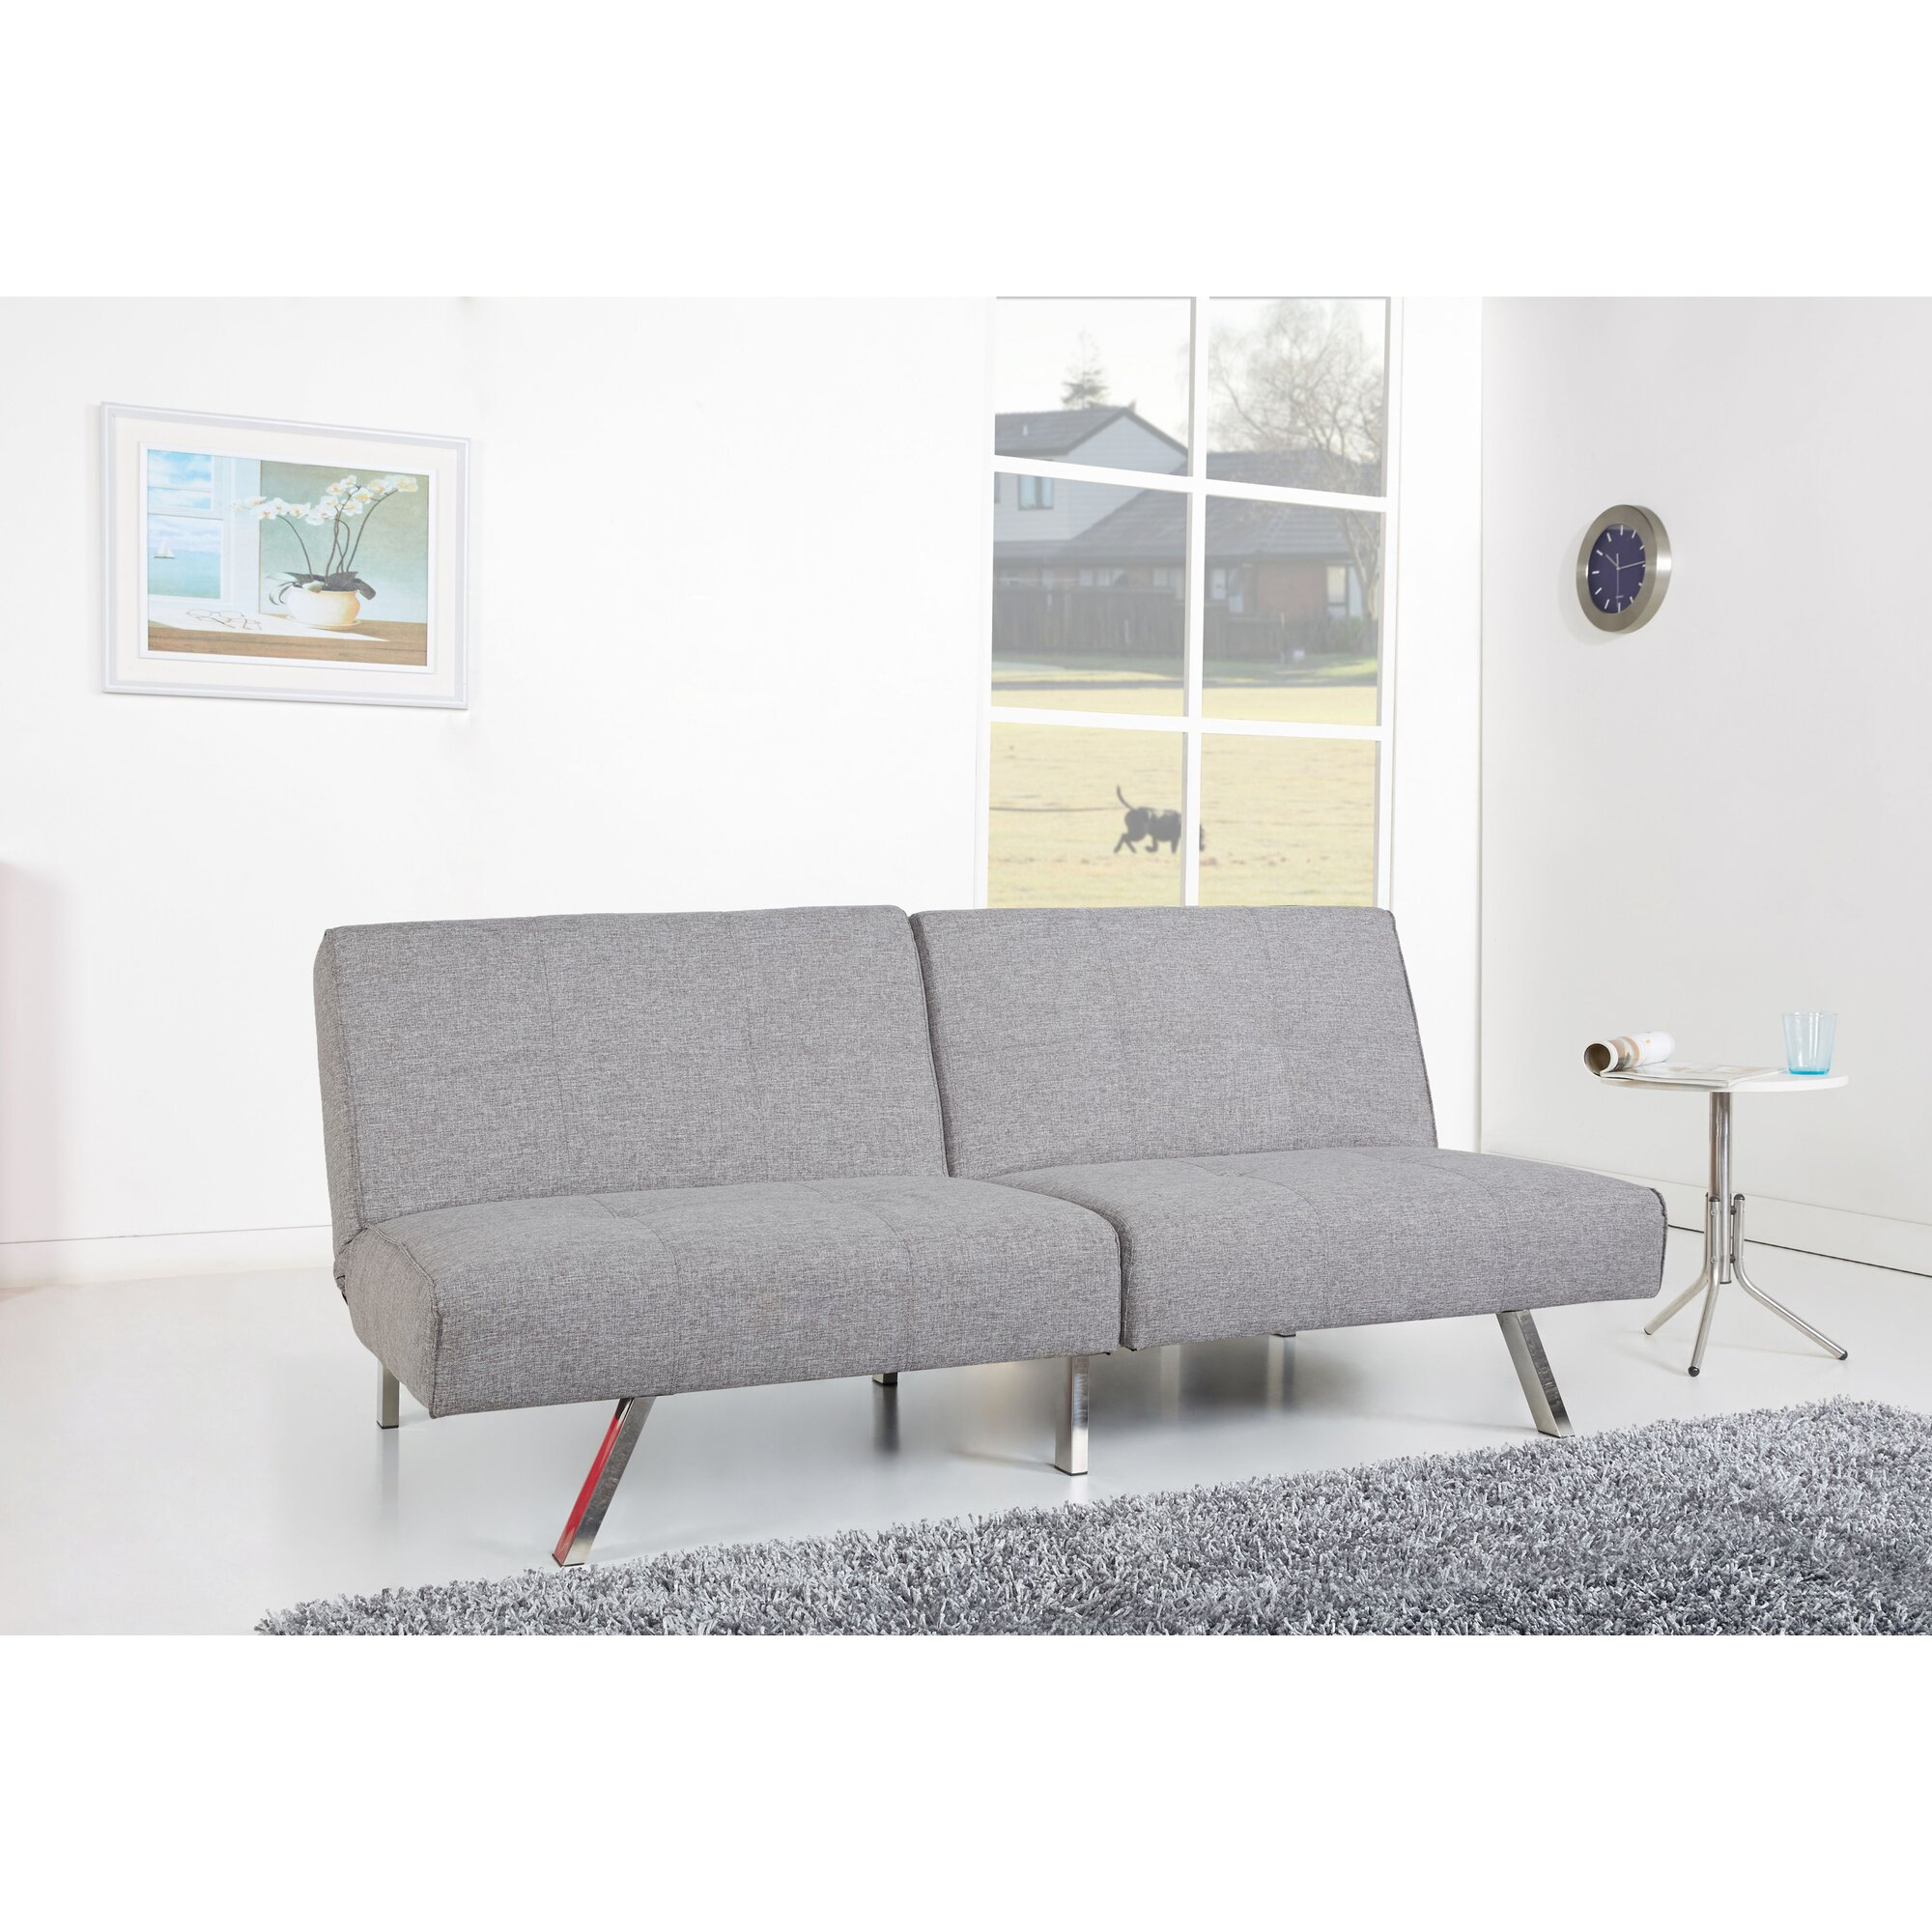 Varick Gallery Rosehill Ash Sleeper Sofa & Reviews | Wayfair